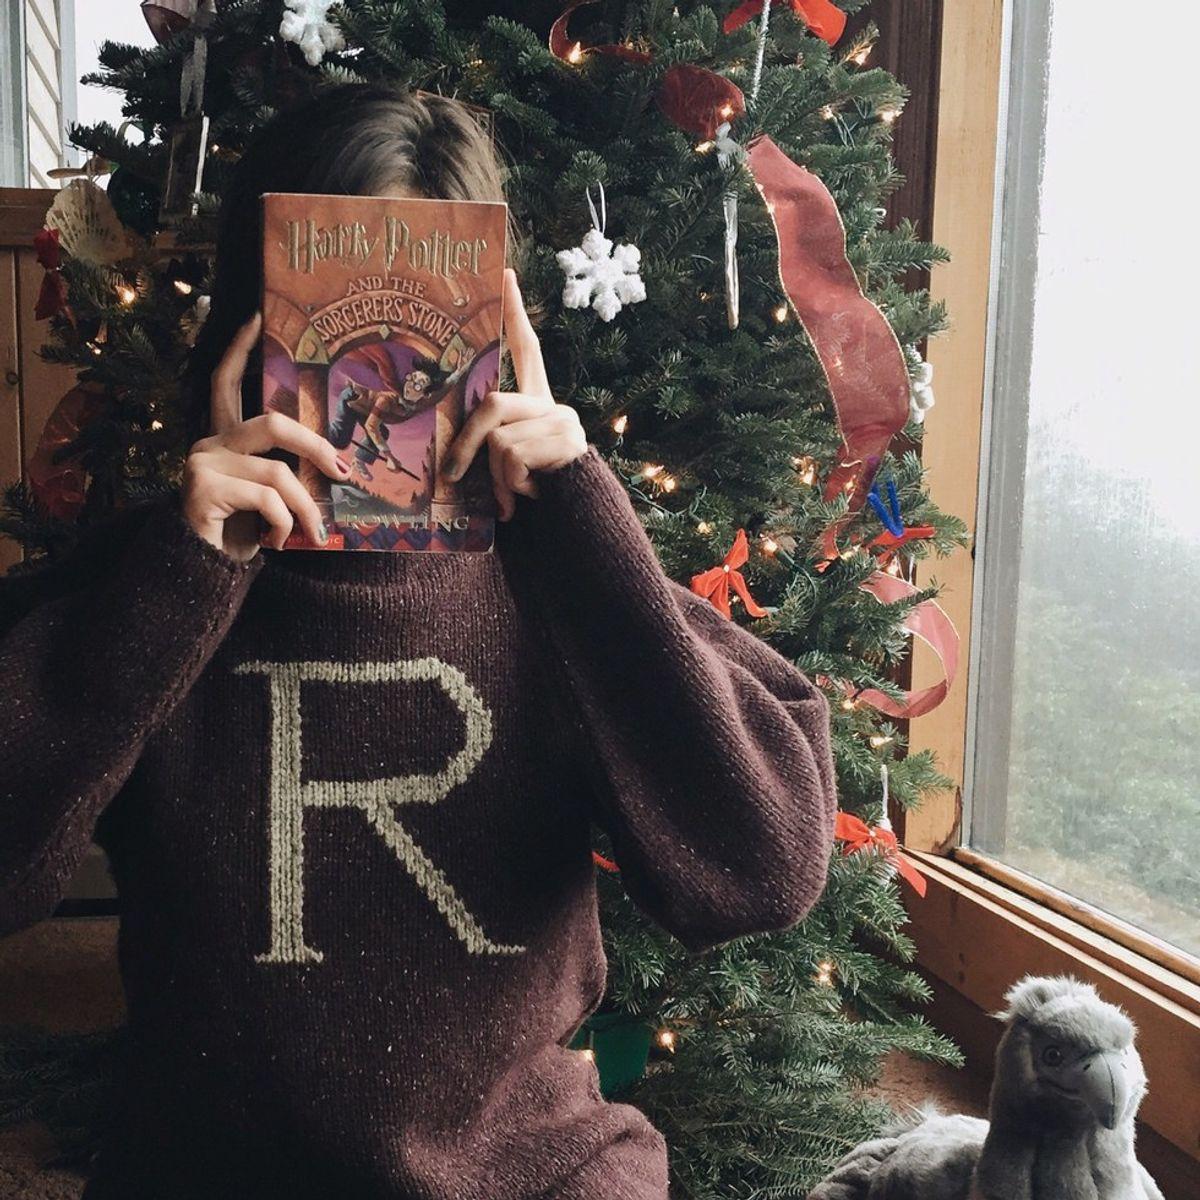 27 Gifts To Get An English Major This Christmas